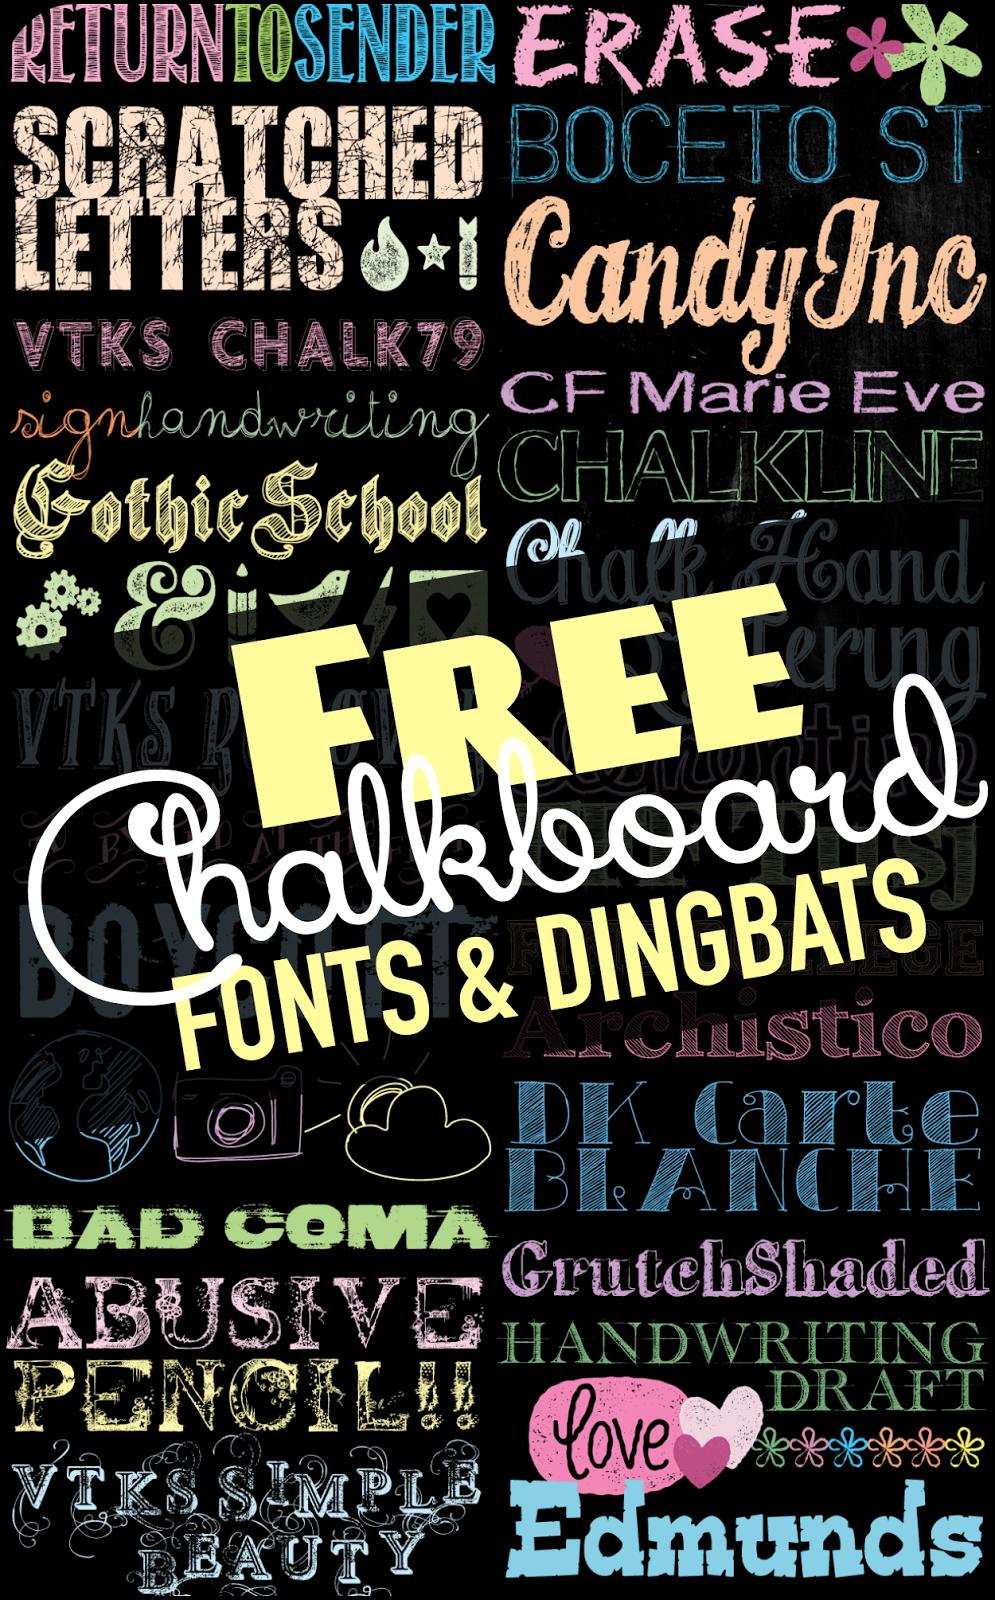 http://1.bp.blogspot.com/-04NxxB43hU0/U6DsTVfW9kI/AAAAAAAAUCI/saIU5yLEmbU/s1600/TONS+of+Free+Chalkboard+Fonts+&+Dingbats+at+U-createcrafts.com.png